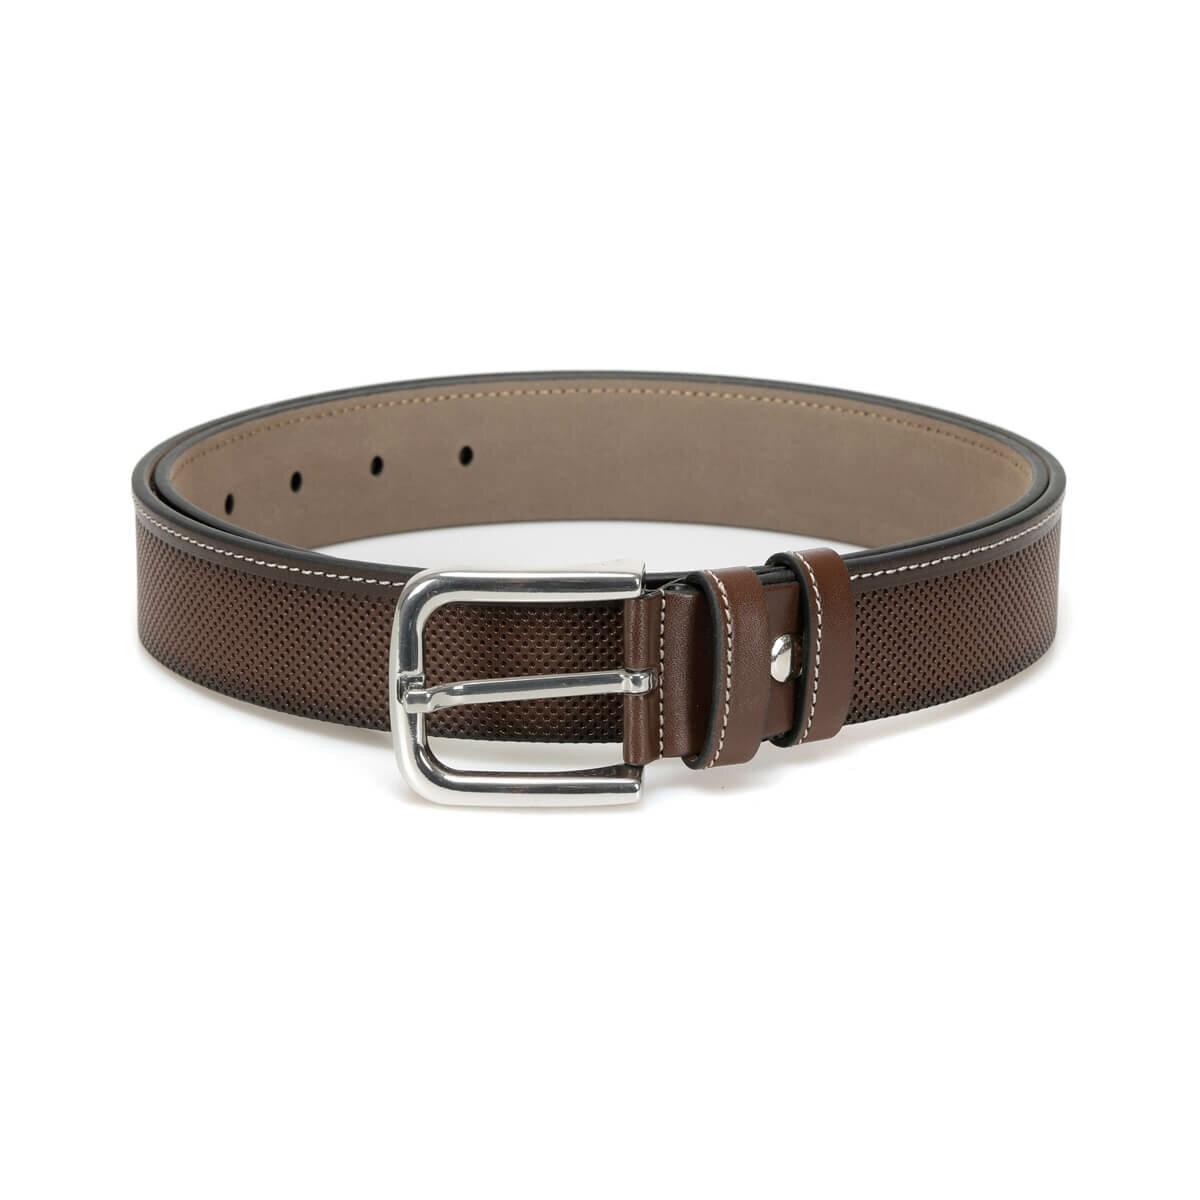 FLO MBRA3405 Brown Men 'S Belt Garamond